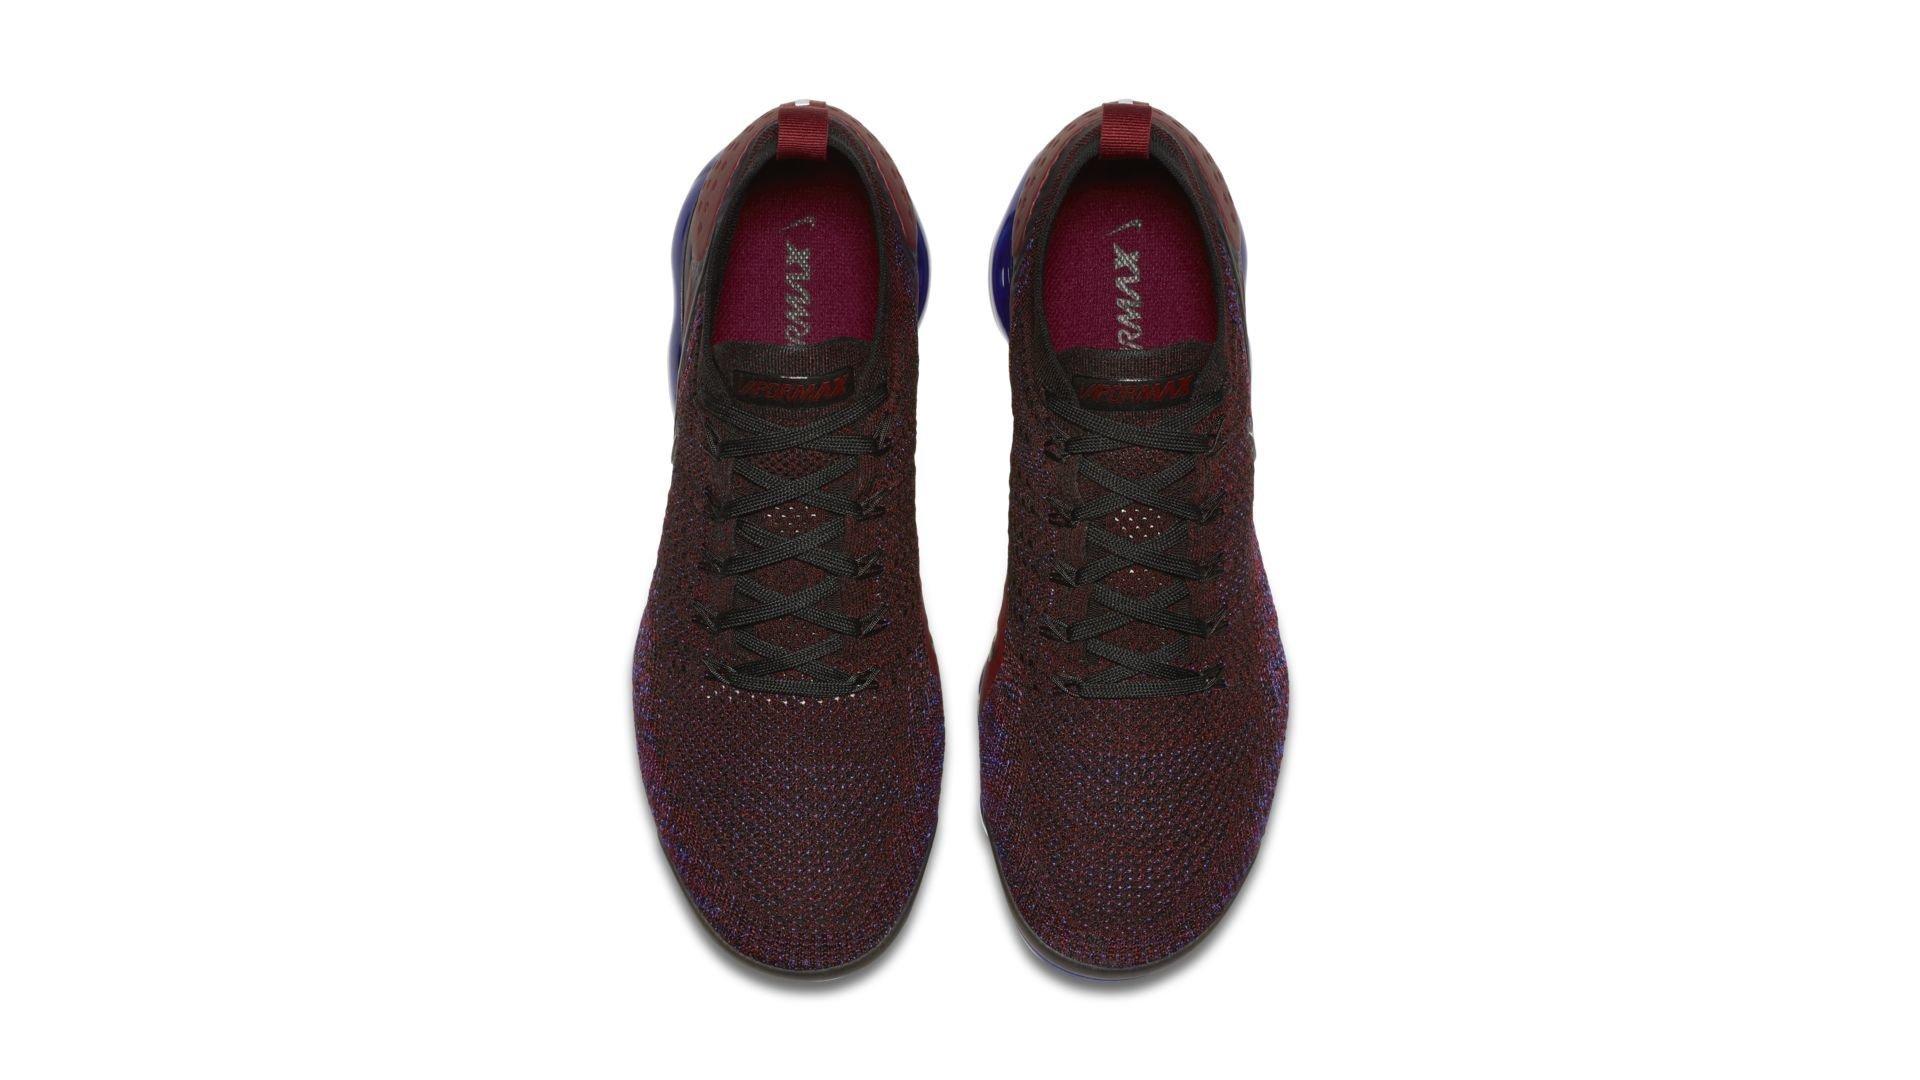 Nike Air VaporMax 2 Team Red Racer Blue (942842-006)